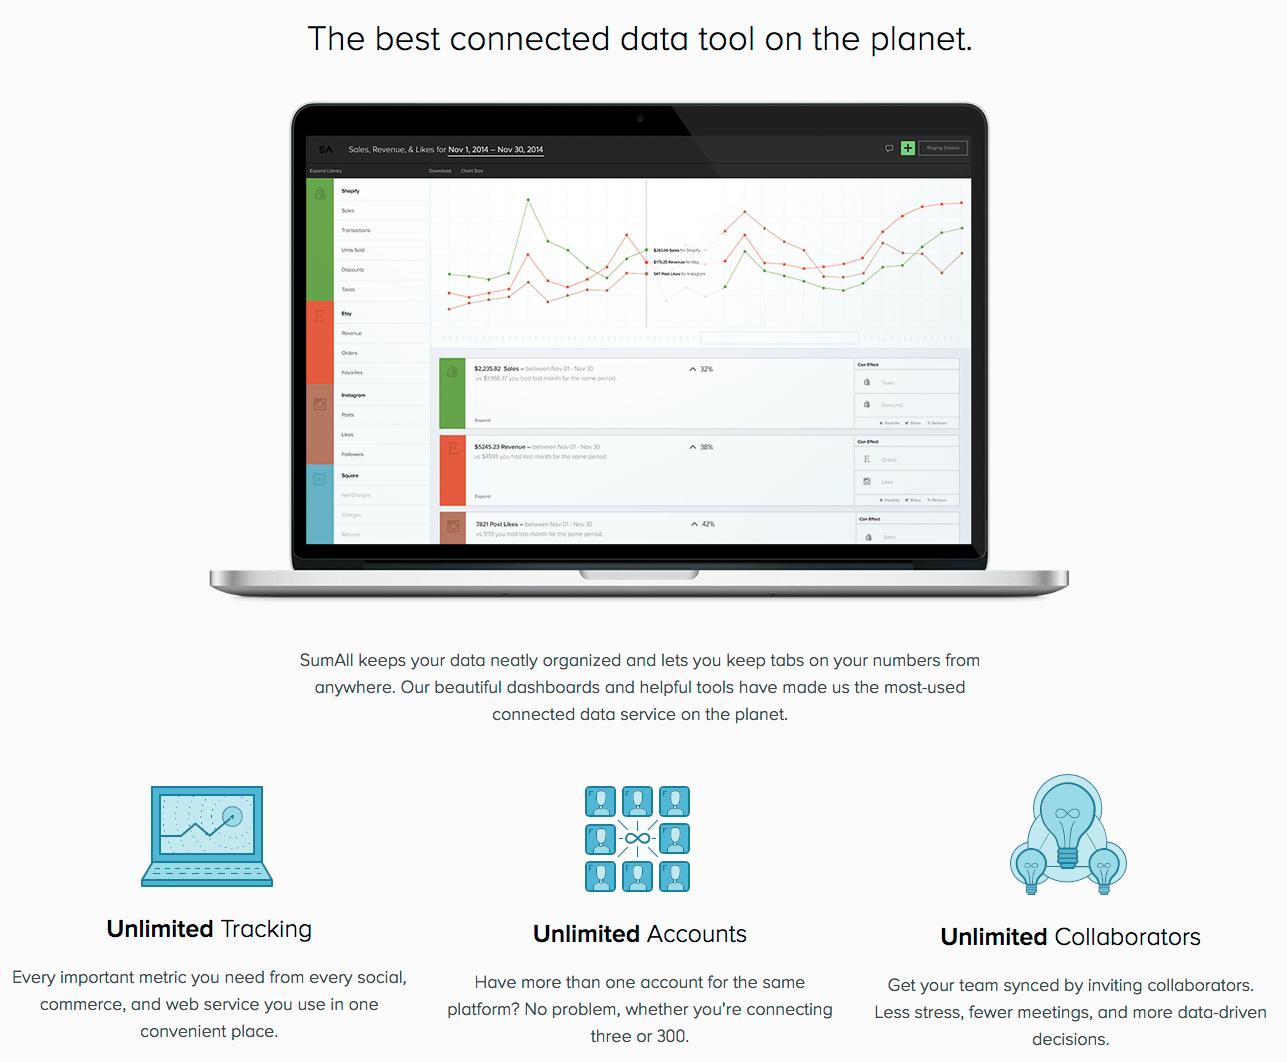 Sumall---Social-media-en-E-commerce-dashboard